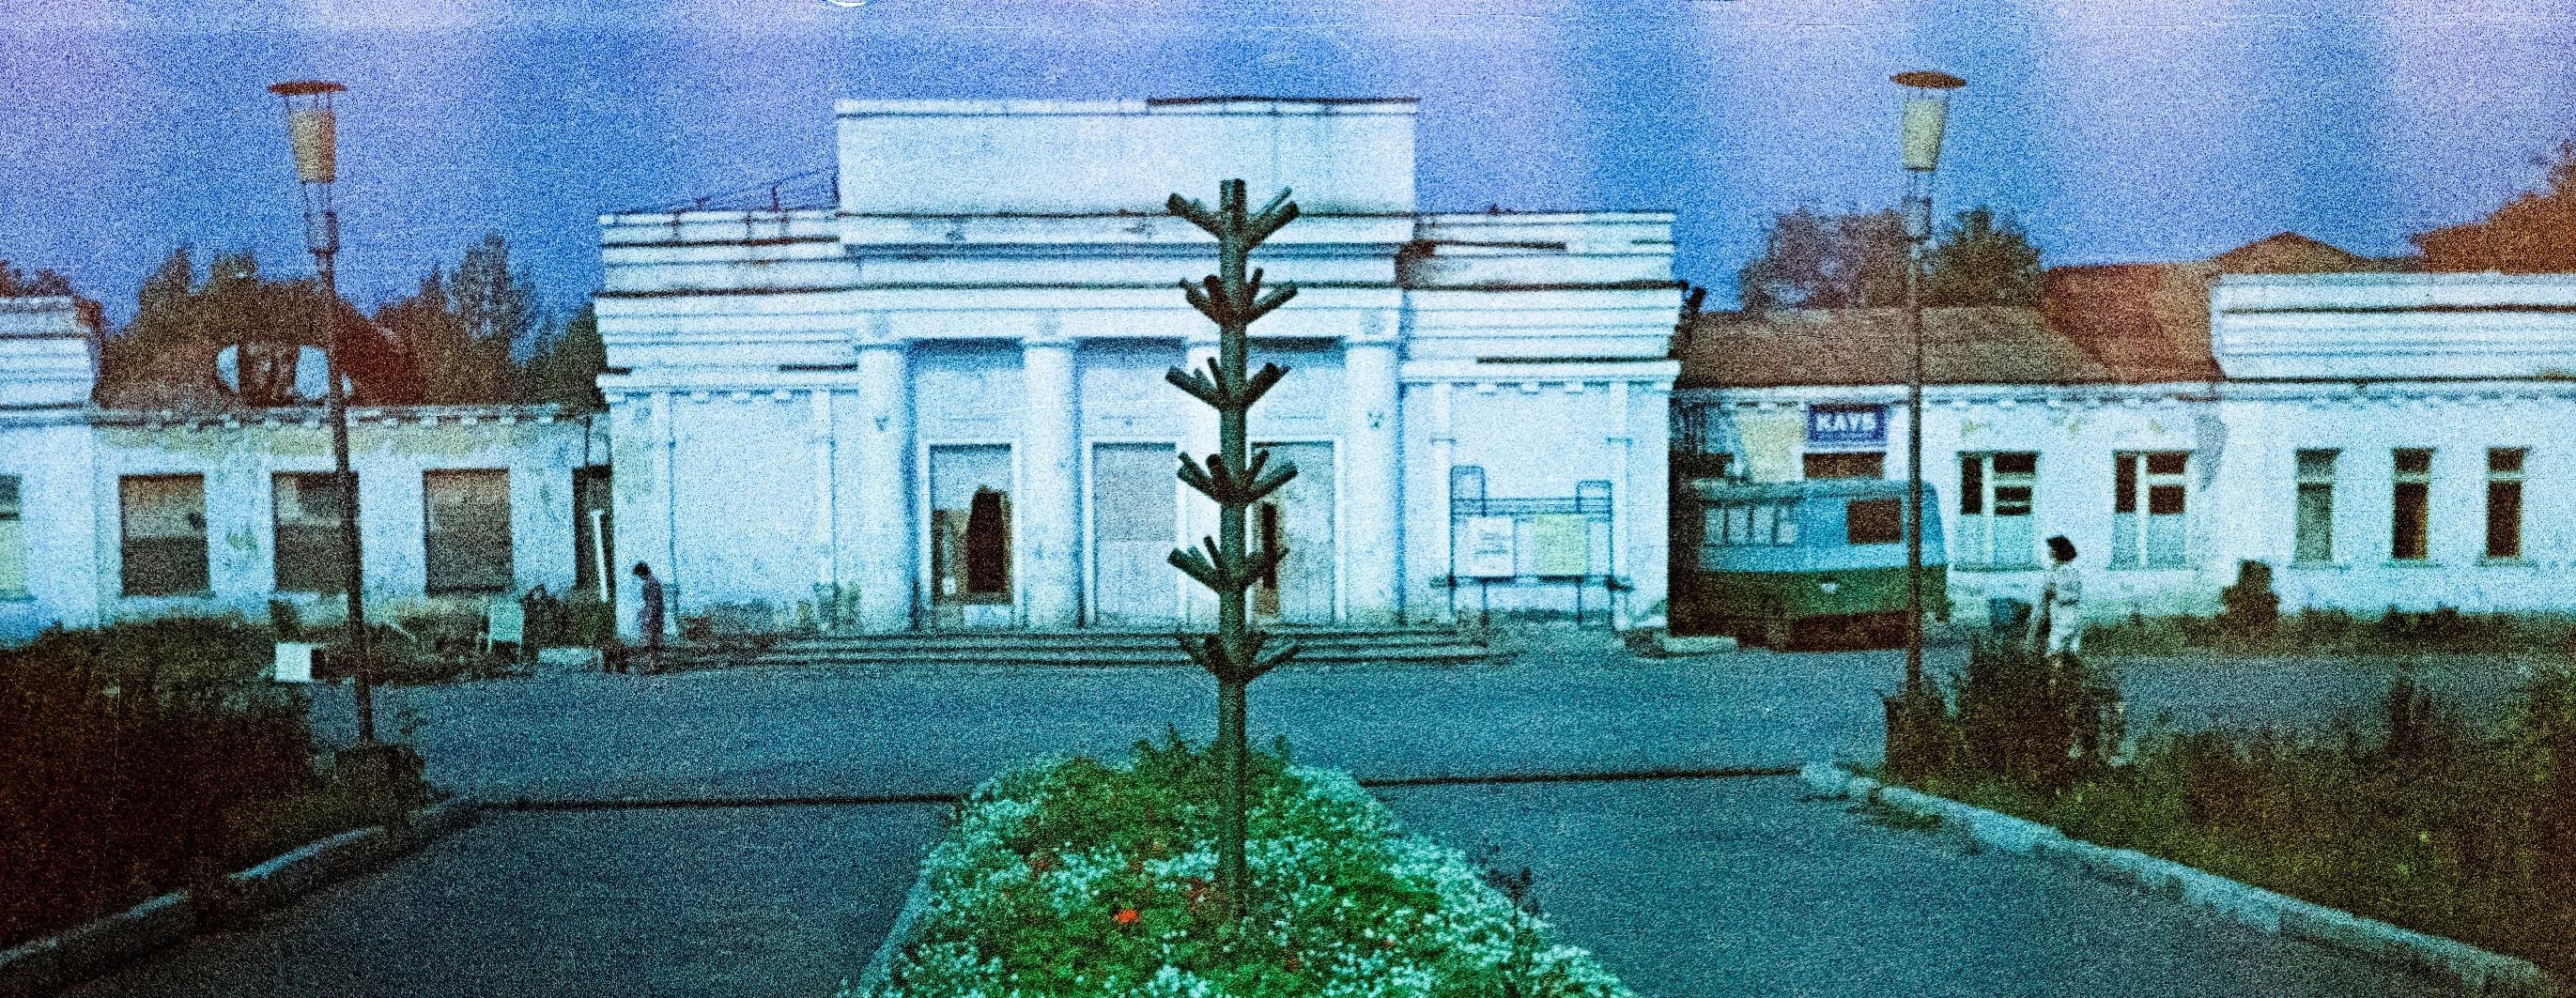 ДК Самарец до реконструкции 1985